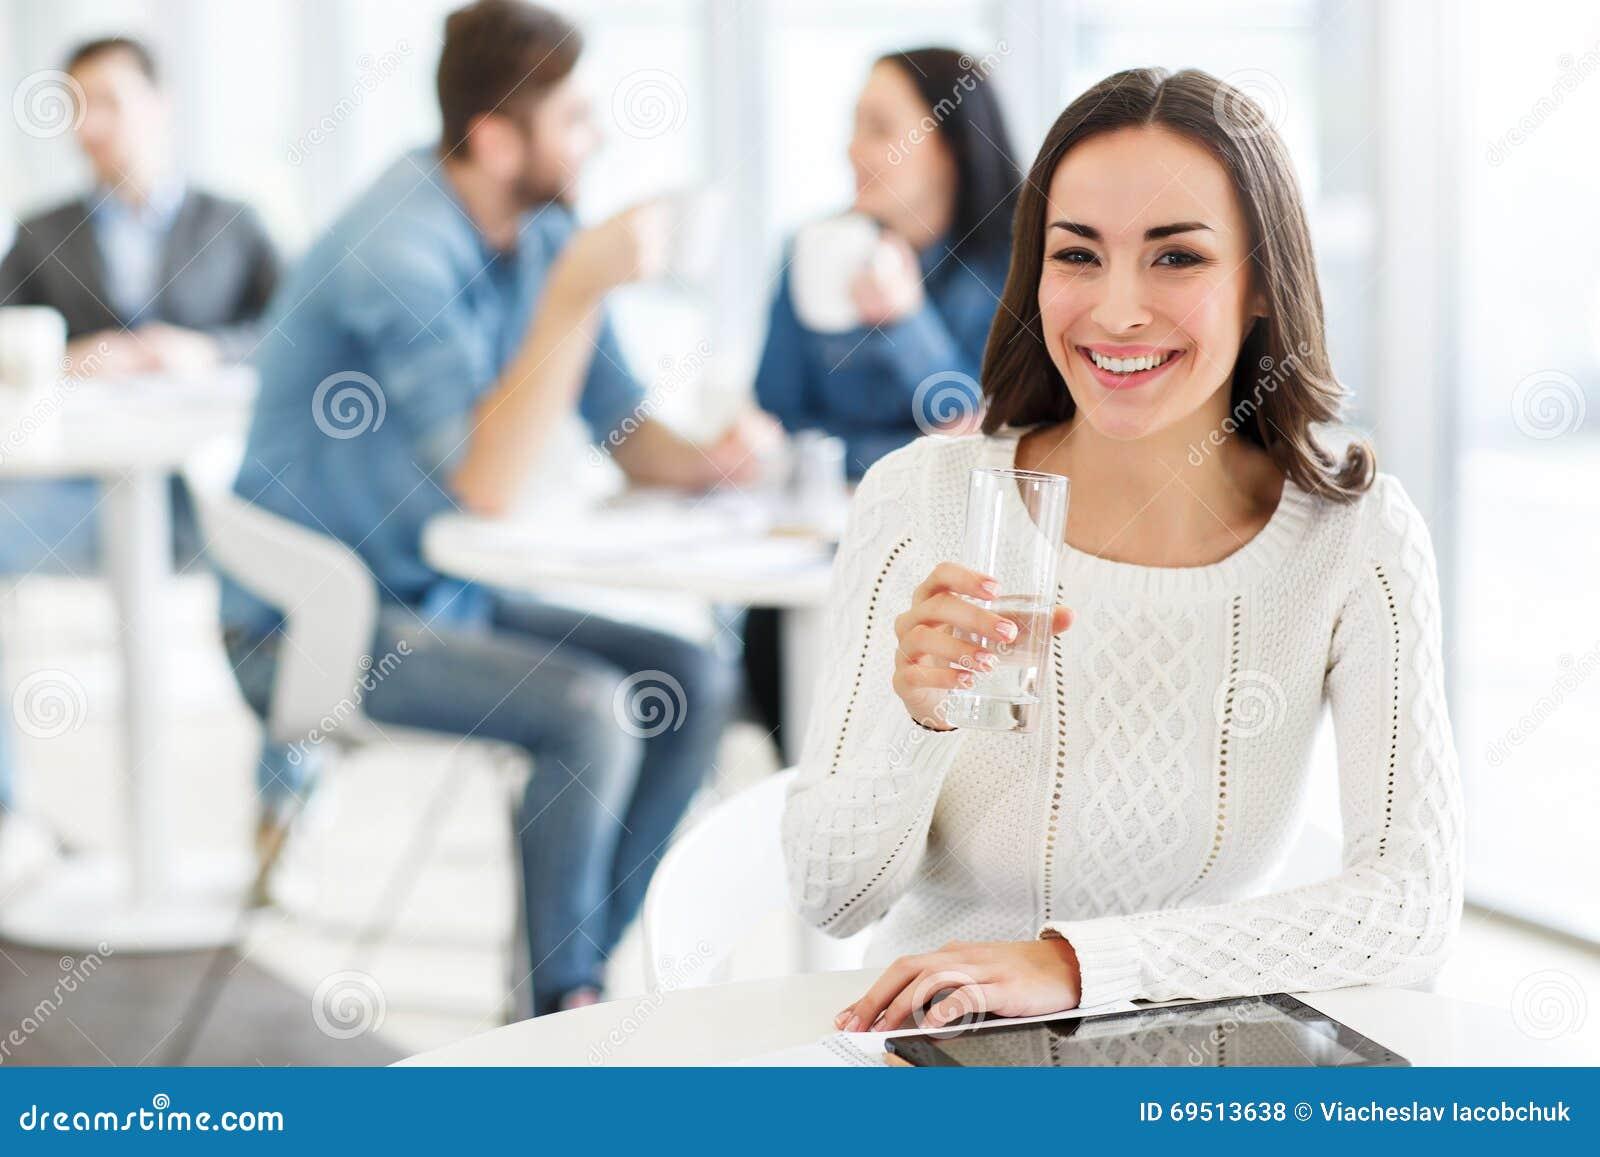 fille avec plaisir s 39 asseyant dans le caf photo stock image 69513638. Black Bedroom Furniture Sets. Home Design Ideas